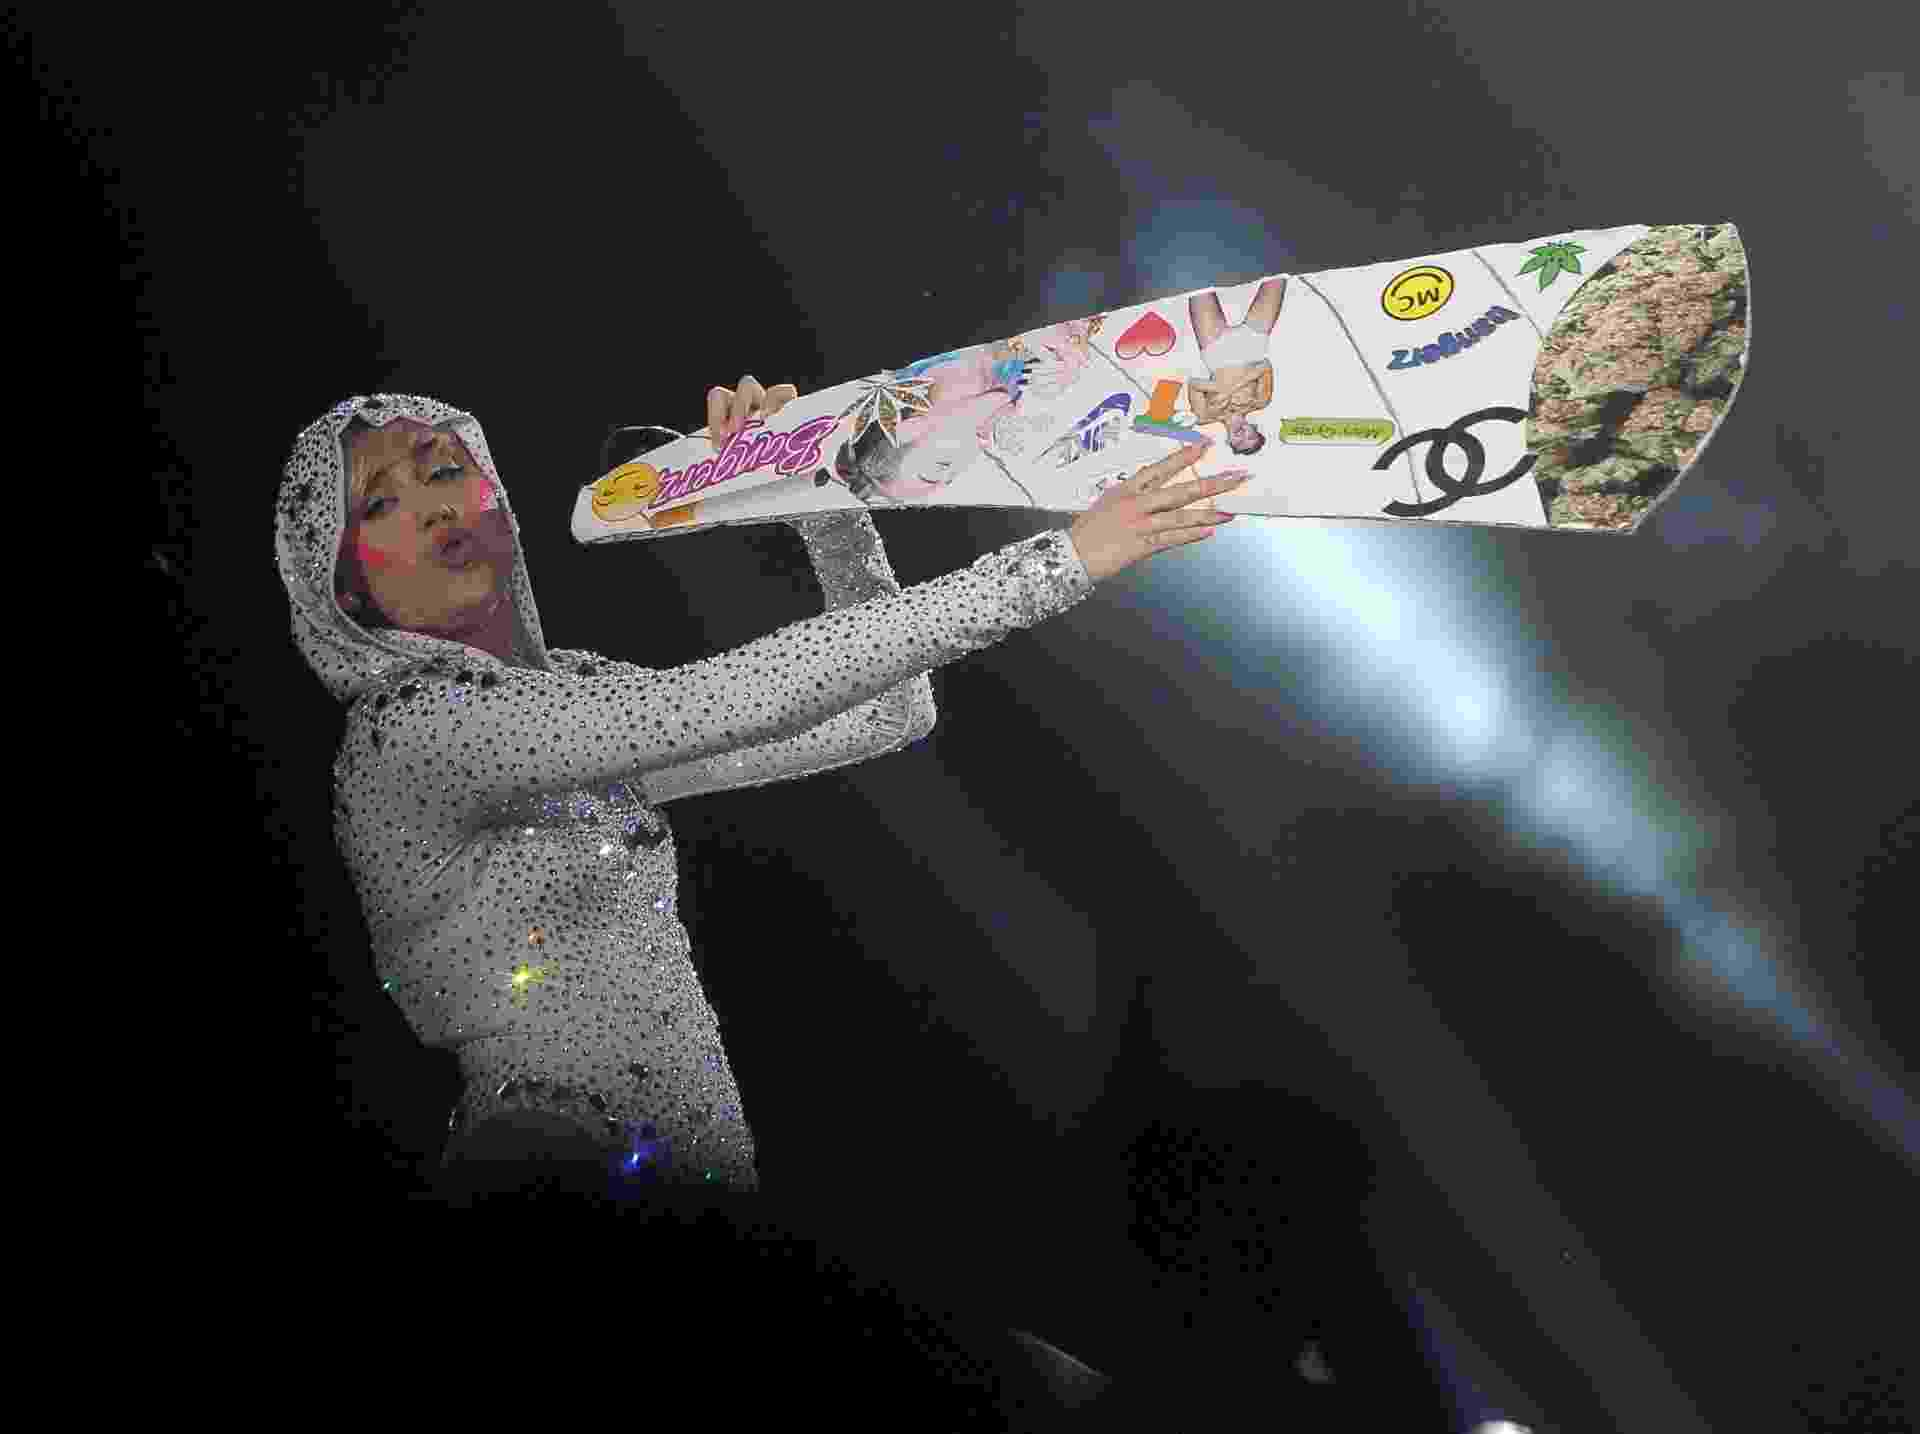 23.jun.2014 - Miley Cyrus apresenta show da turnê Bangerz em Amsterdã, na Holanda - SplashNews